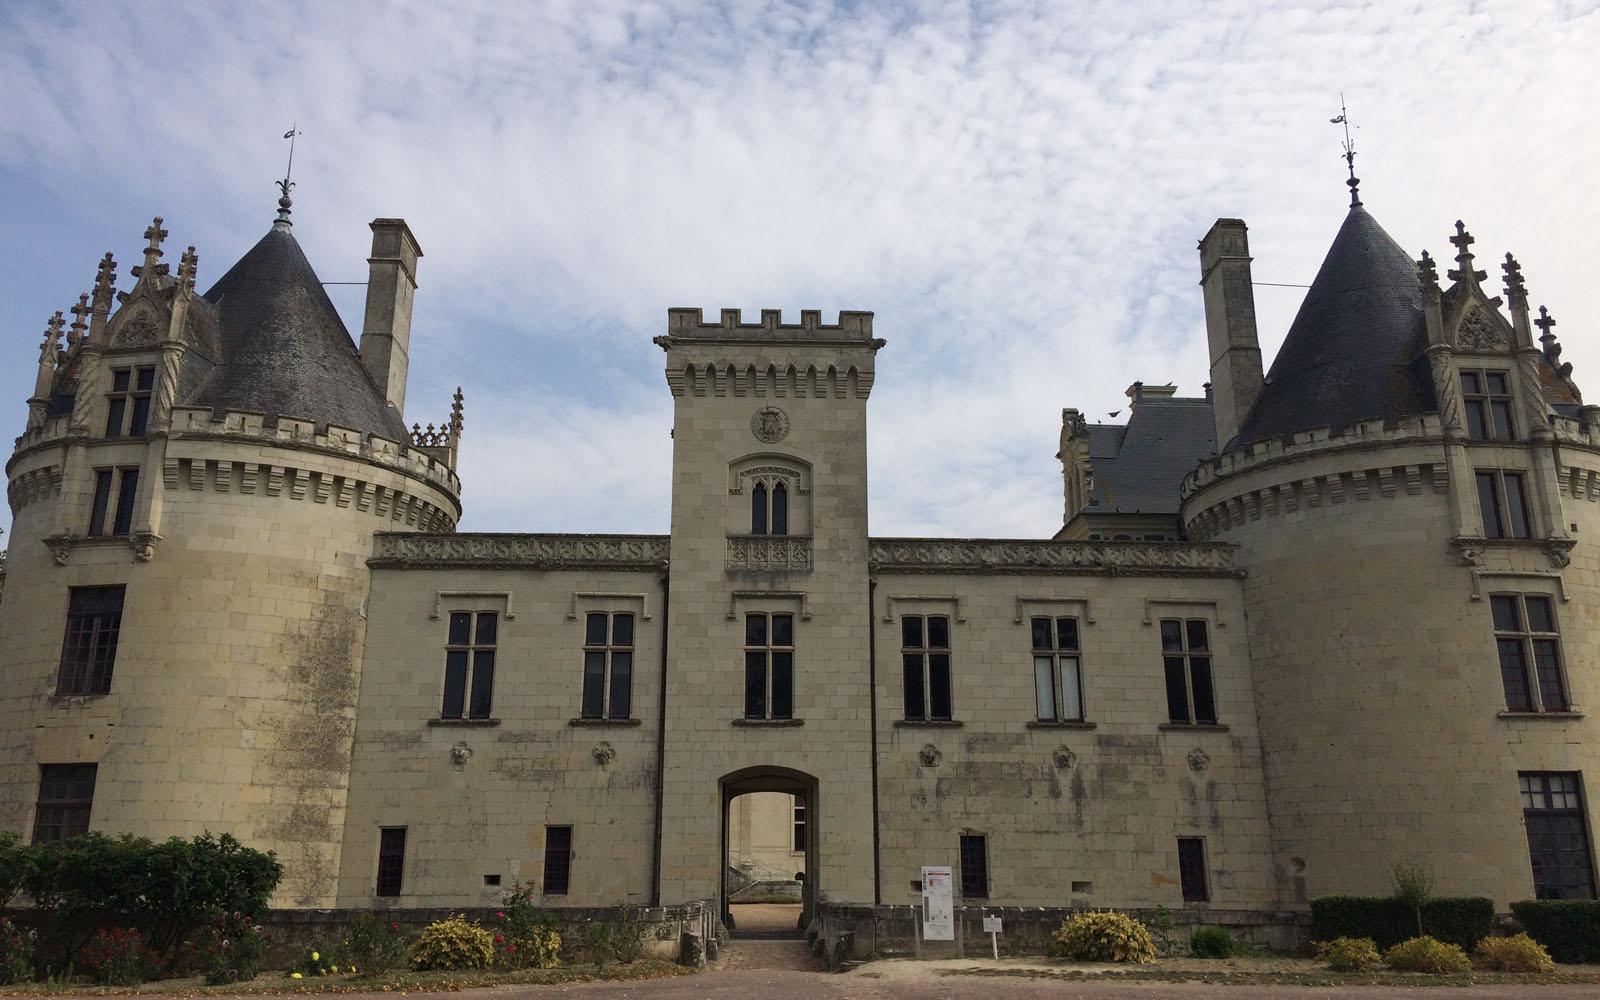 Il castello di Brézé, ad appena 10 minuti da Saumur.